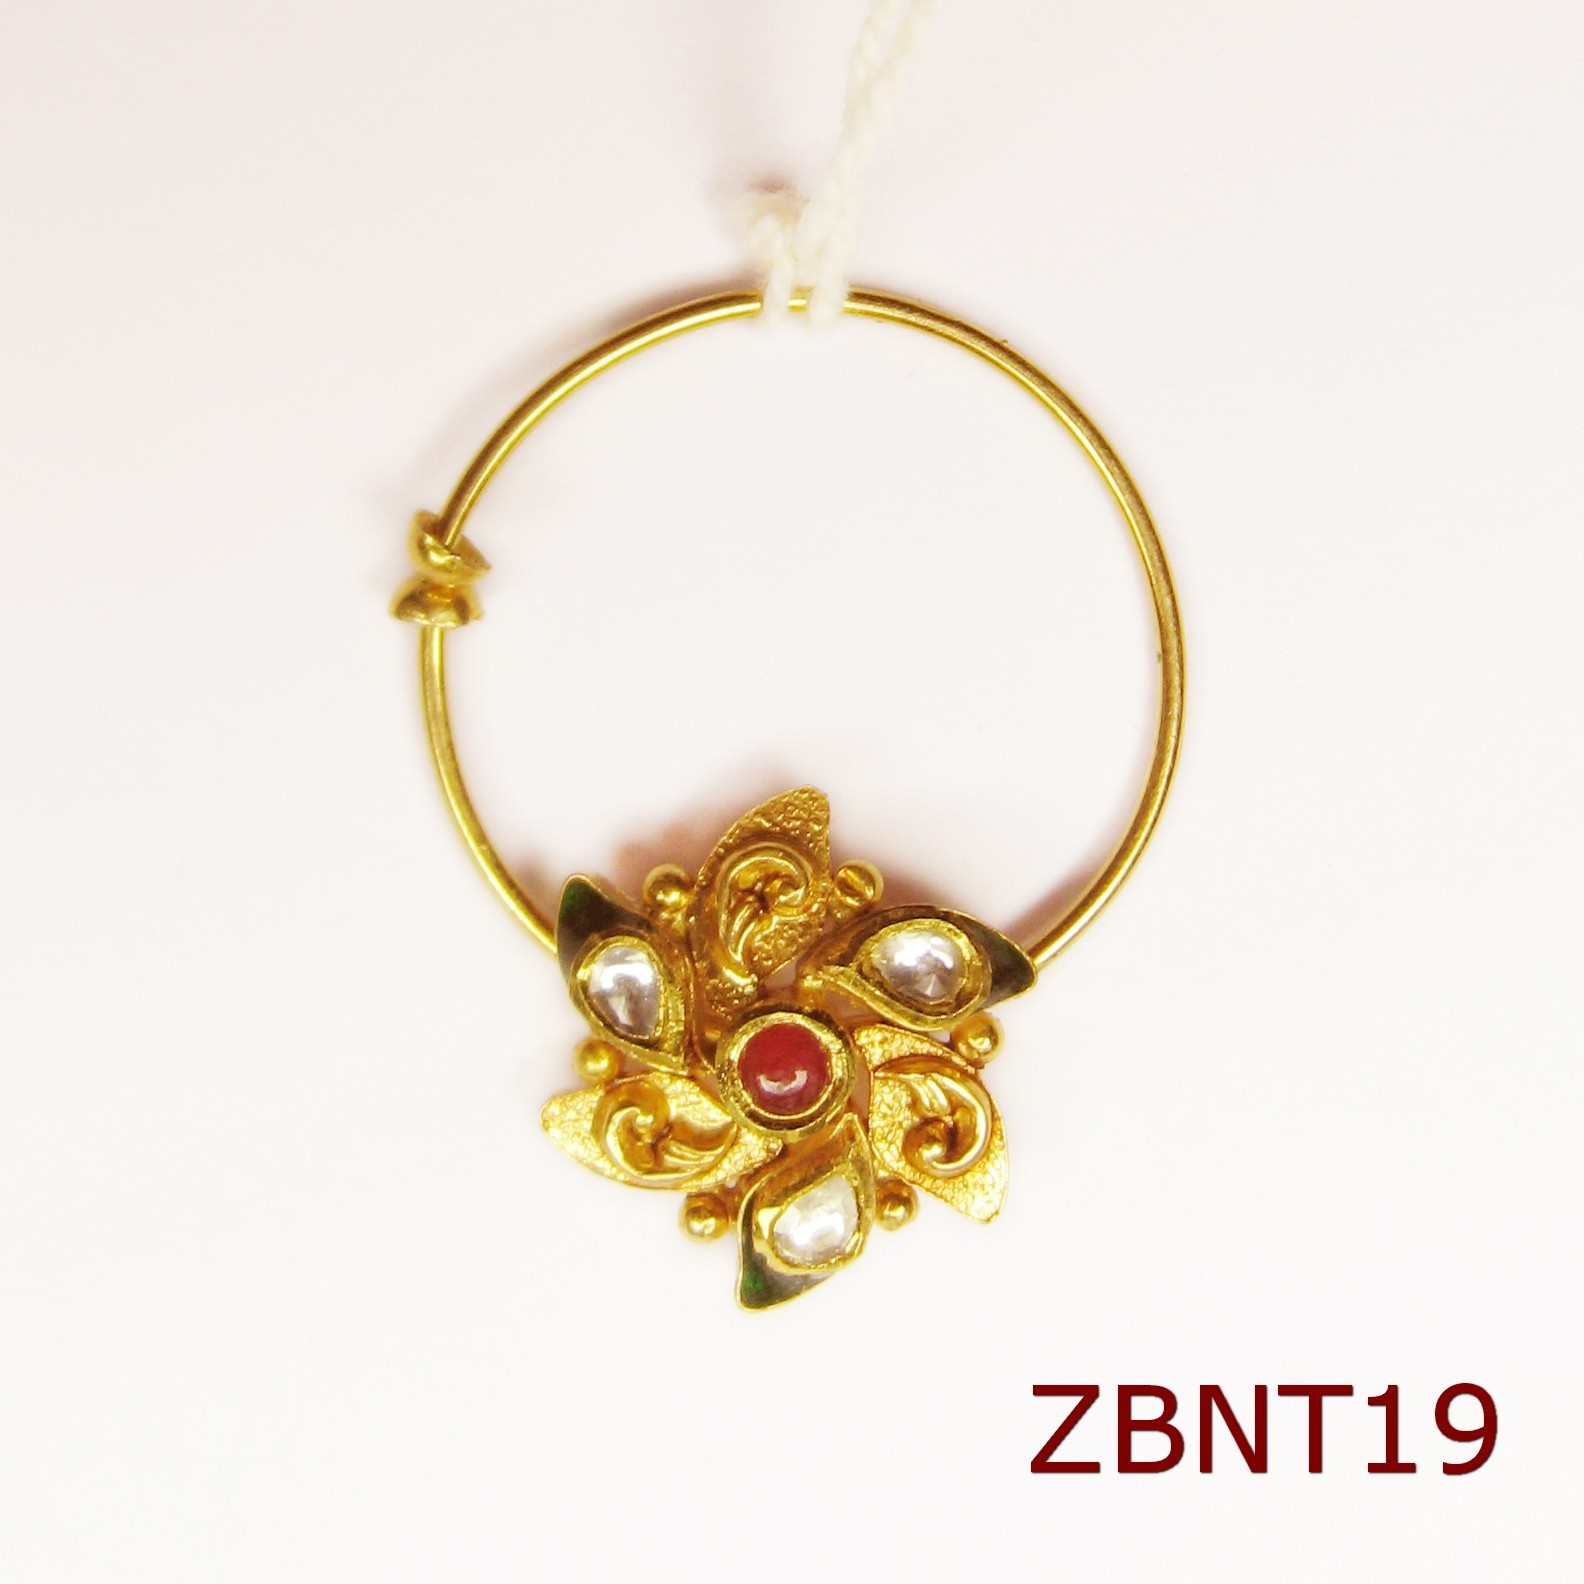 ZBNT19